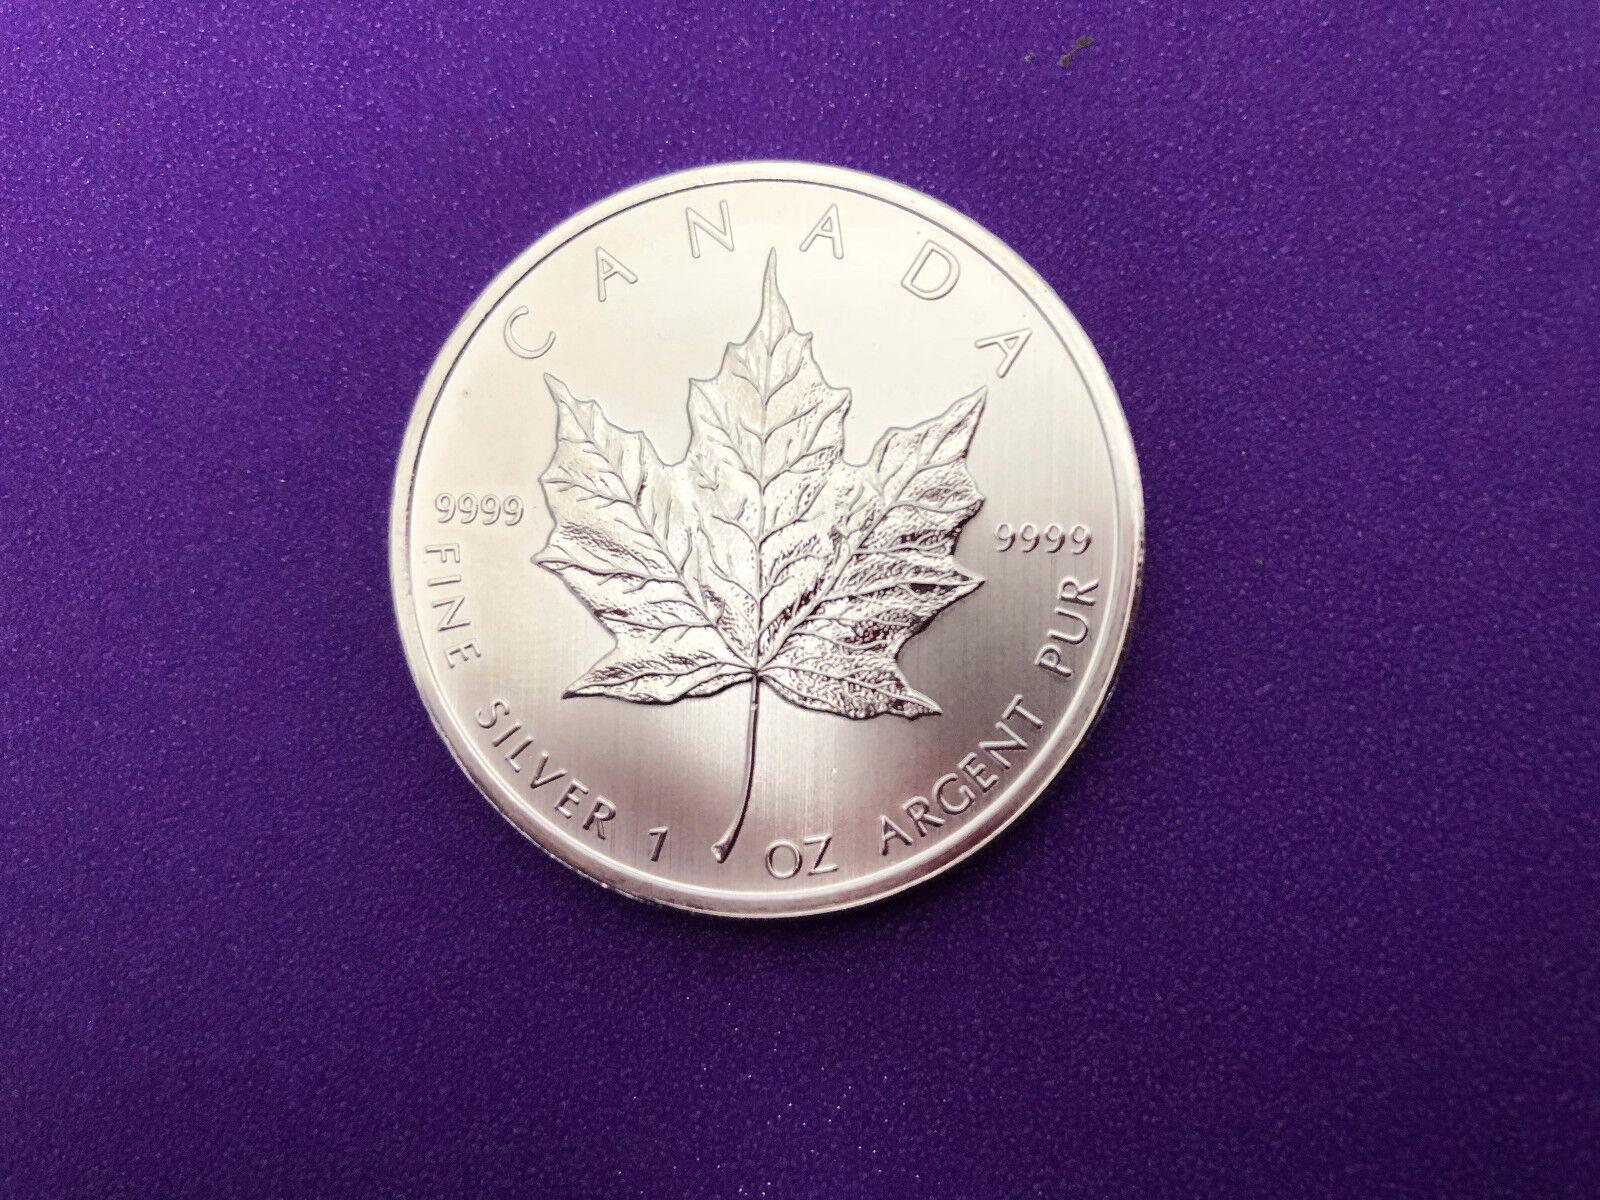 canadian maple leaf silver coins - HD1600×1200